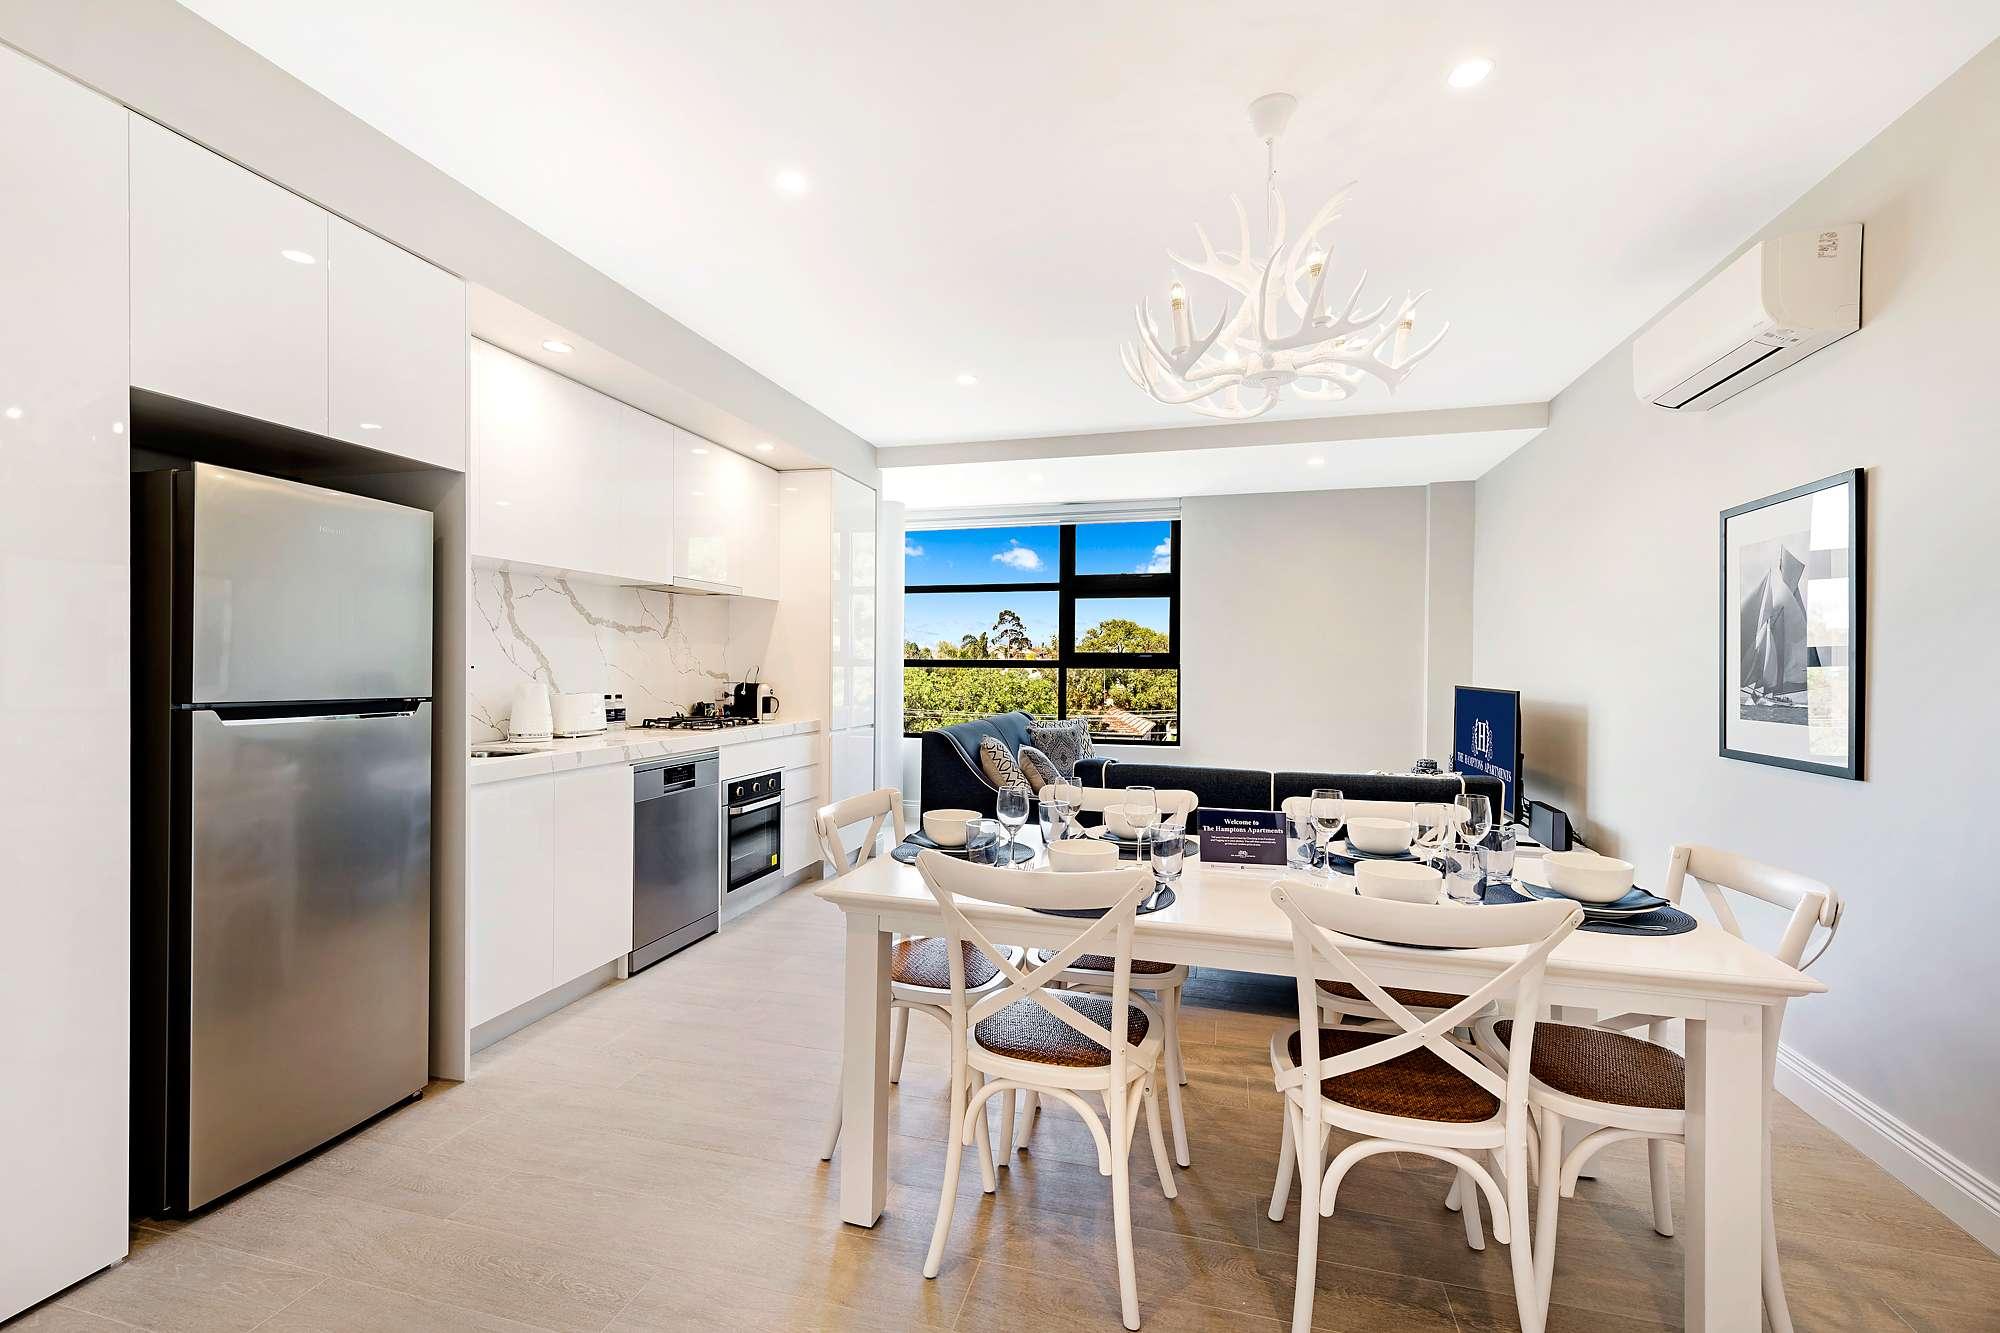 1167-The-Hamptons-Apartments-154-Chapel-St-St-Kilda-VIC-3182-photo22